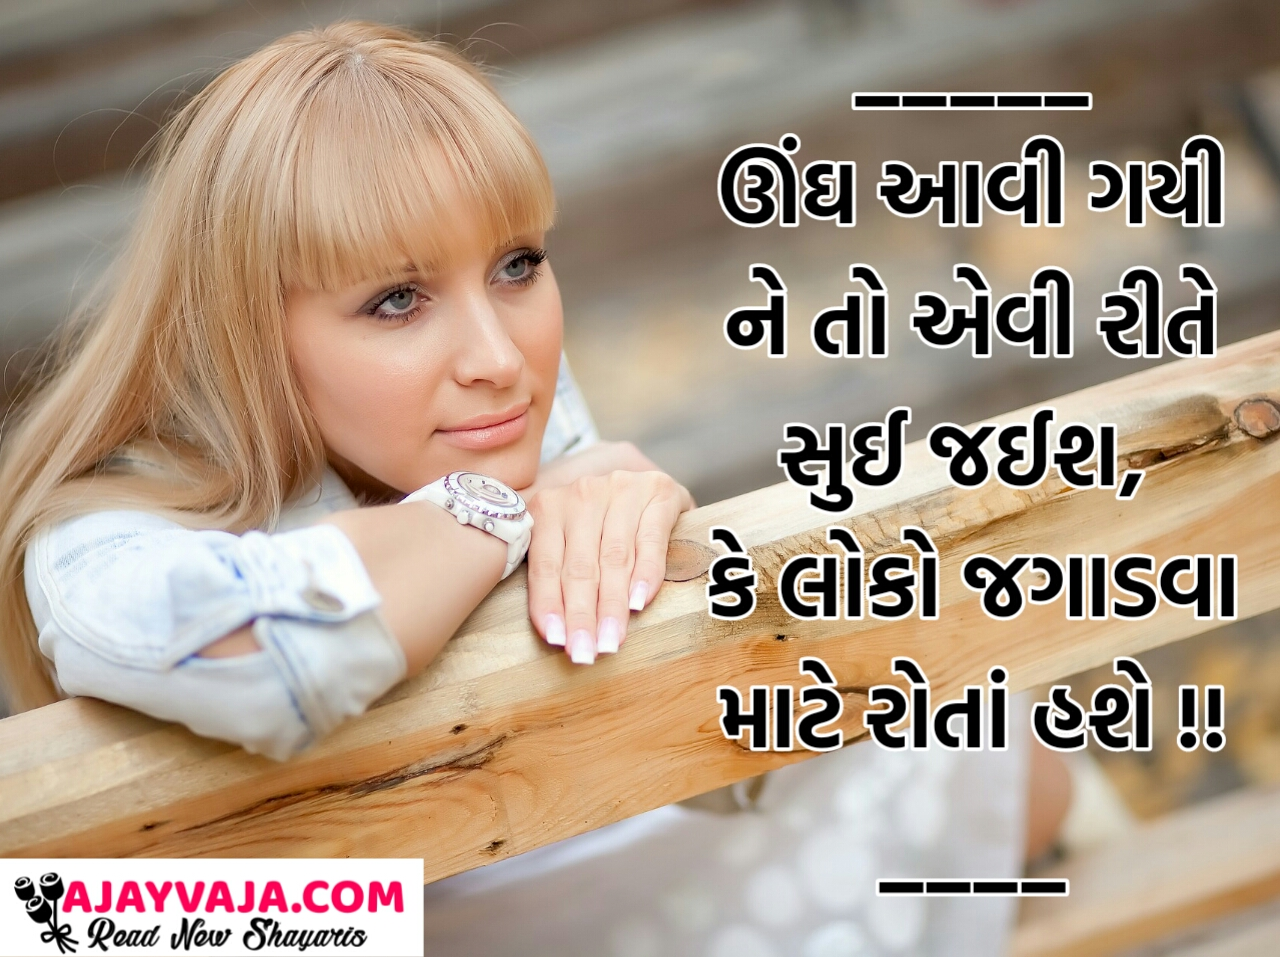 Gujarati shayari with photos